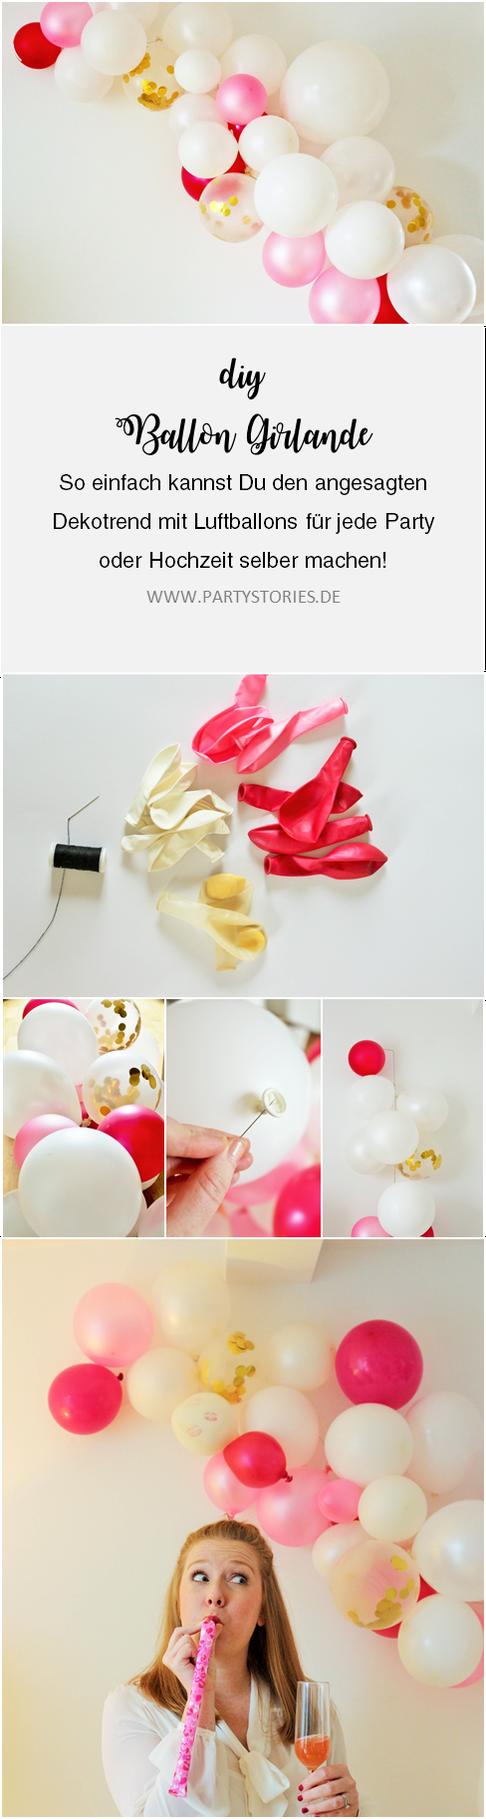 anleitung moderne luftballon girlande einfach selber machen party ideas decorations. Black Bedroom Furniture Sets. Home Design Ideas